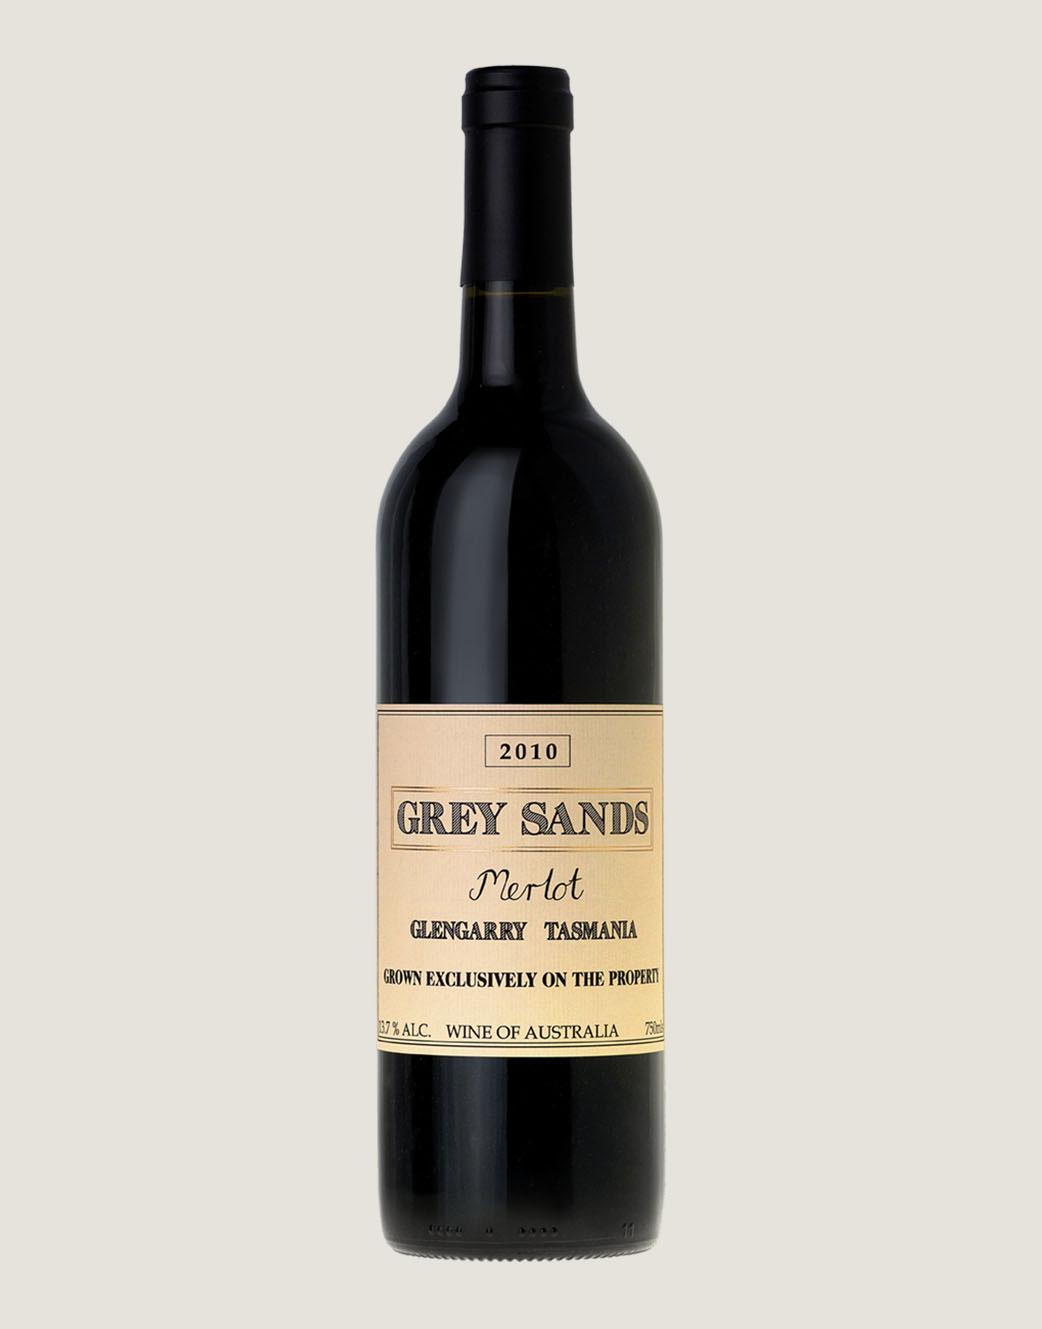 Bottle shot of Grey Sands 2010 Merlot